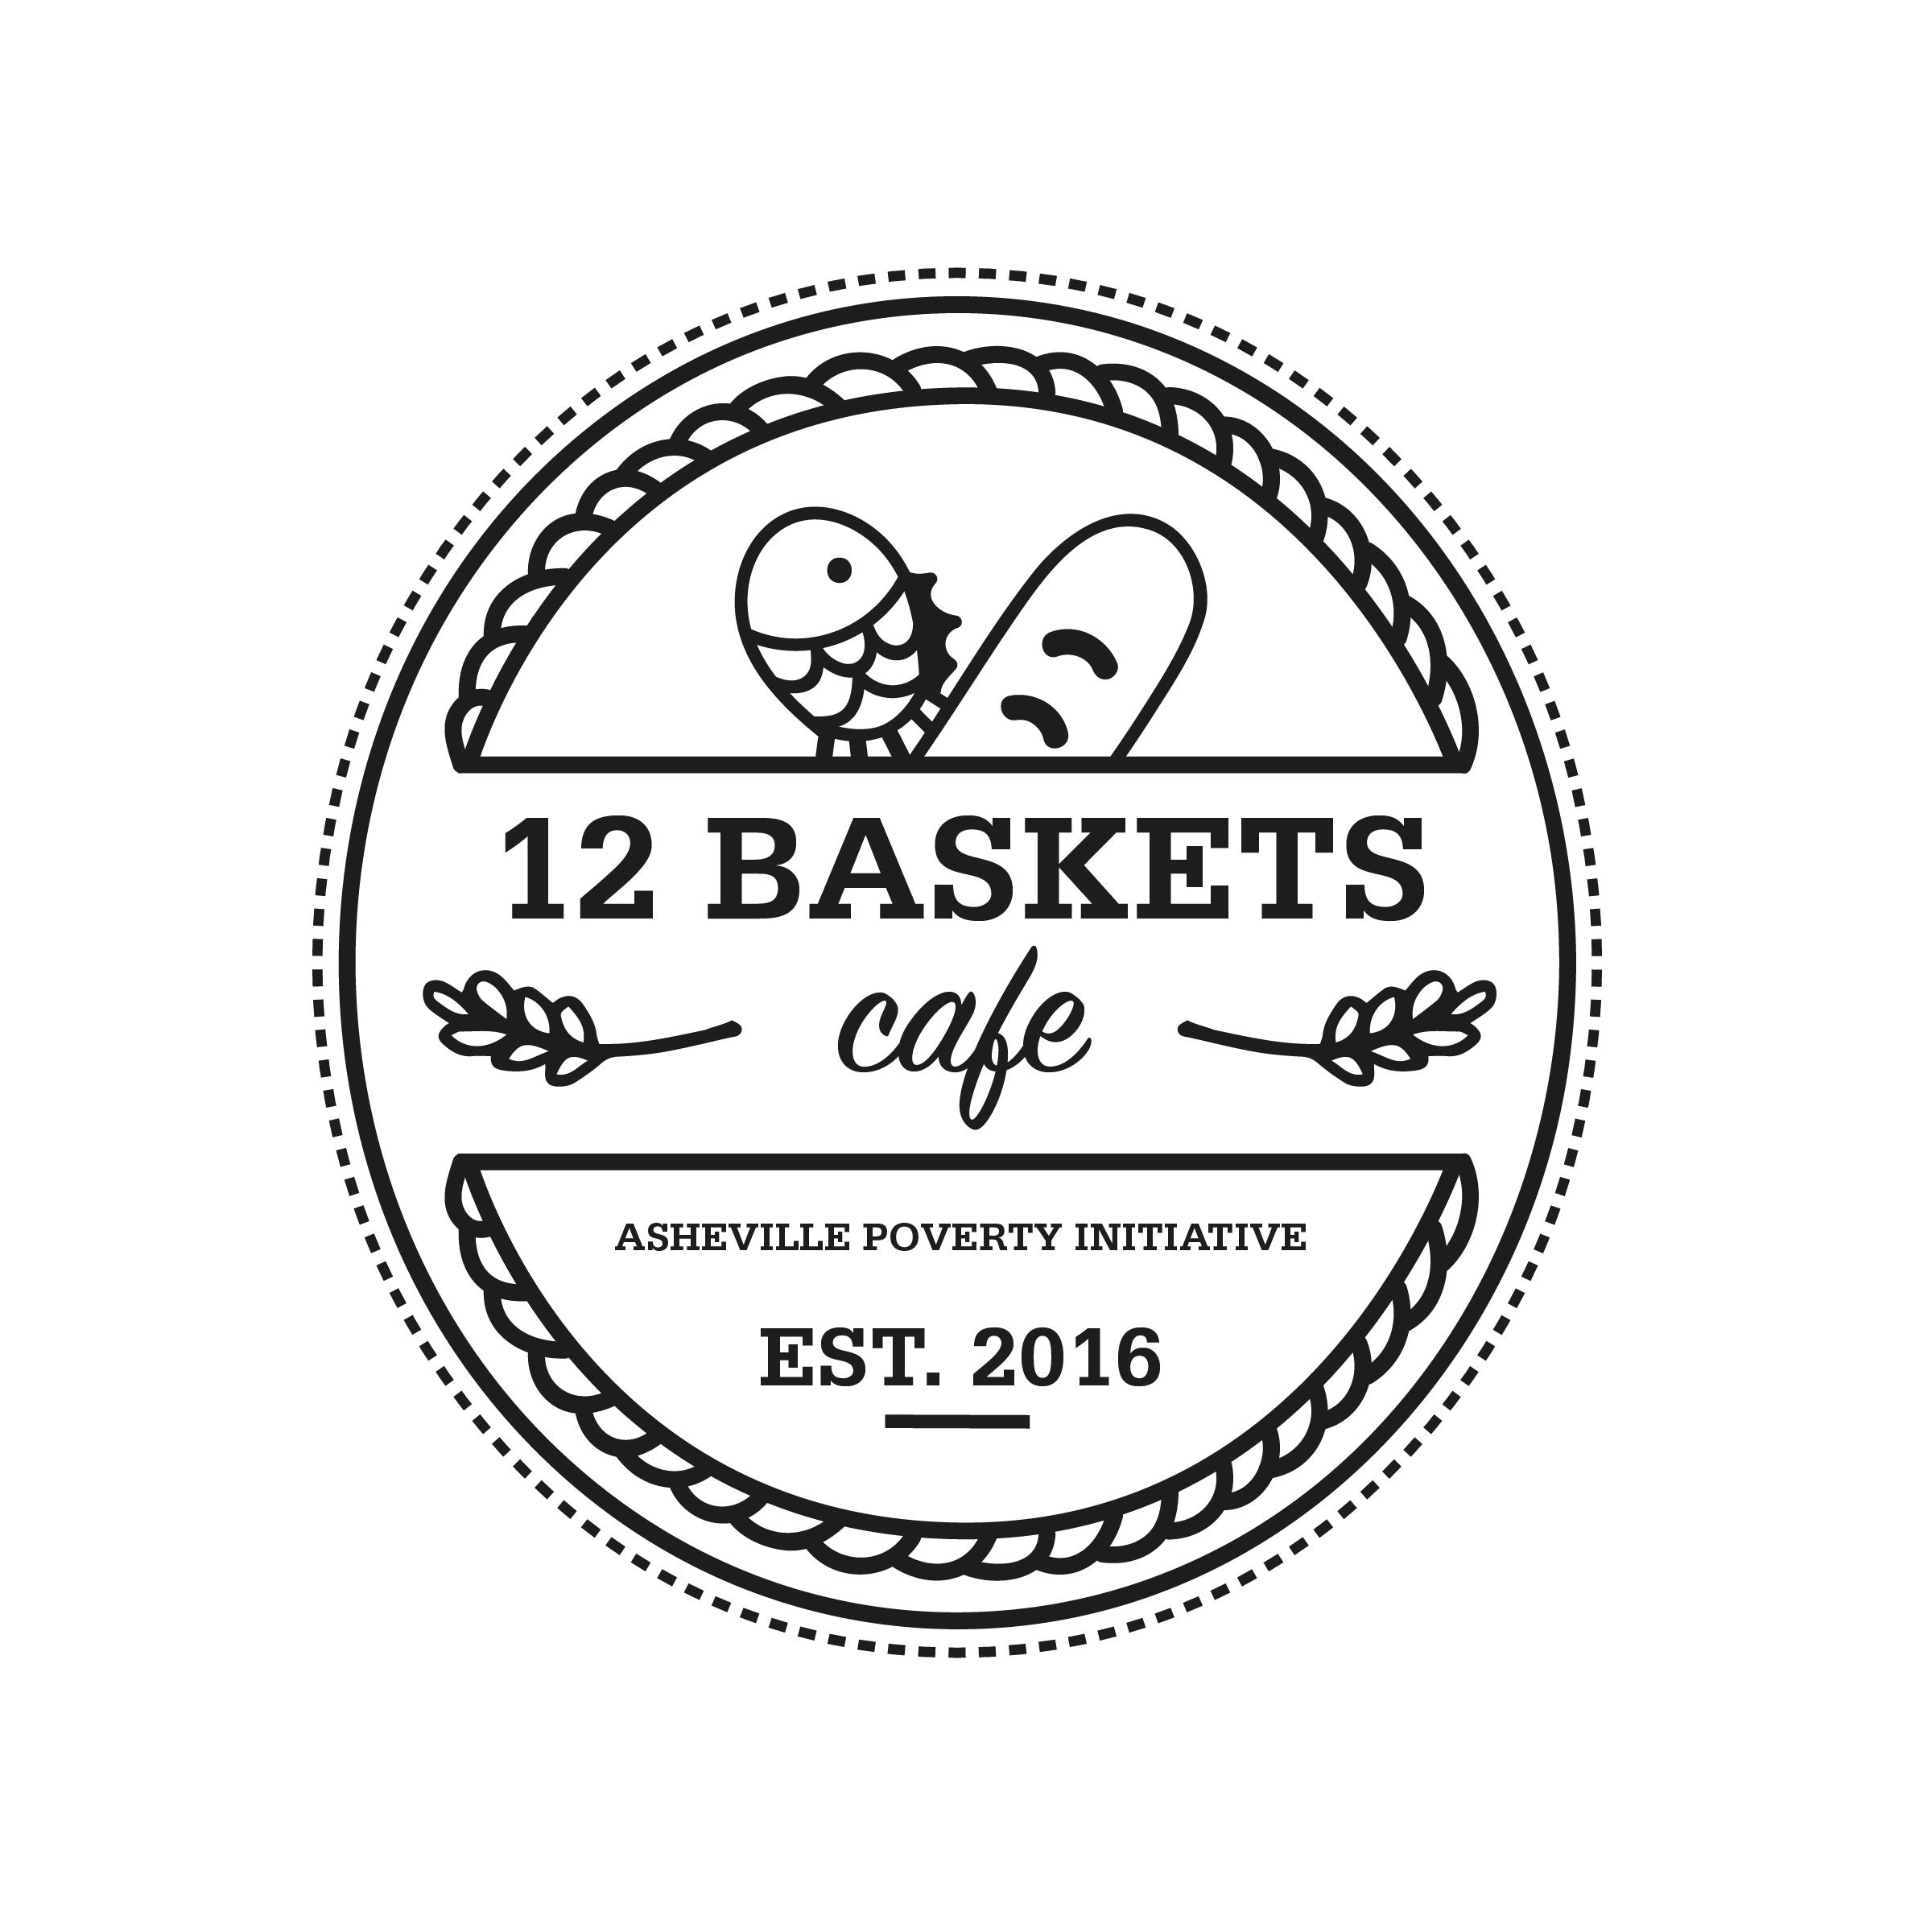 website_12 baskets_03-01.jpg